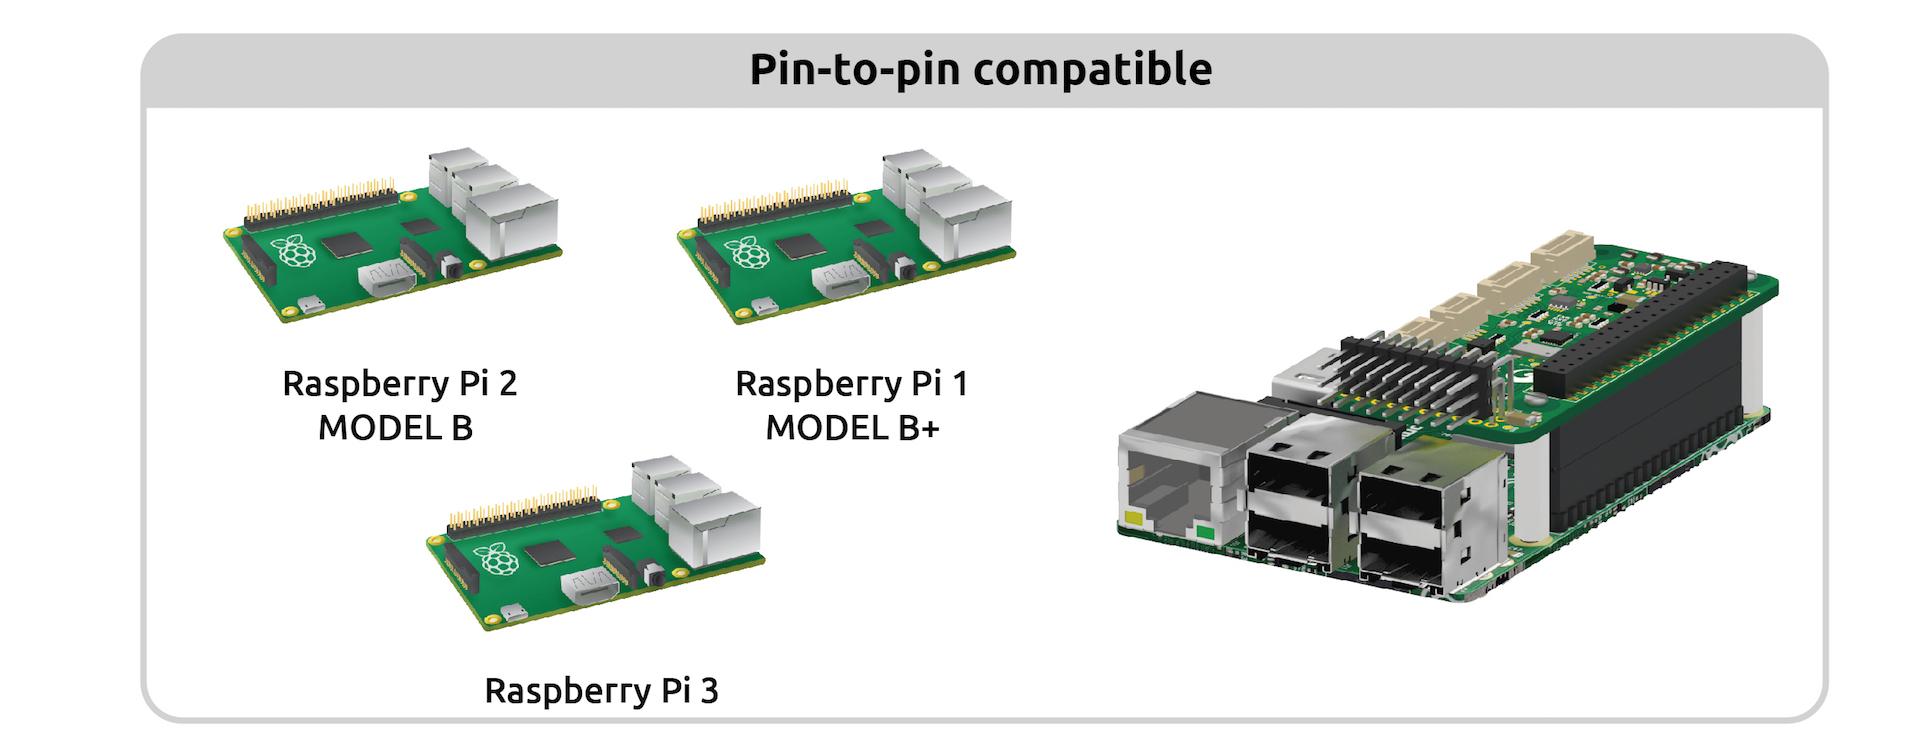 Pxfmini Wiring Quick Start Copter Documentation. Pxfmini Wiring Chart. Wiring. Raspberry Pi Drone Wiring Diagram At Scoala.co